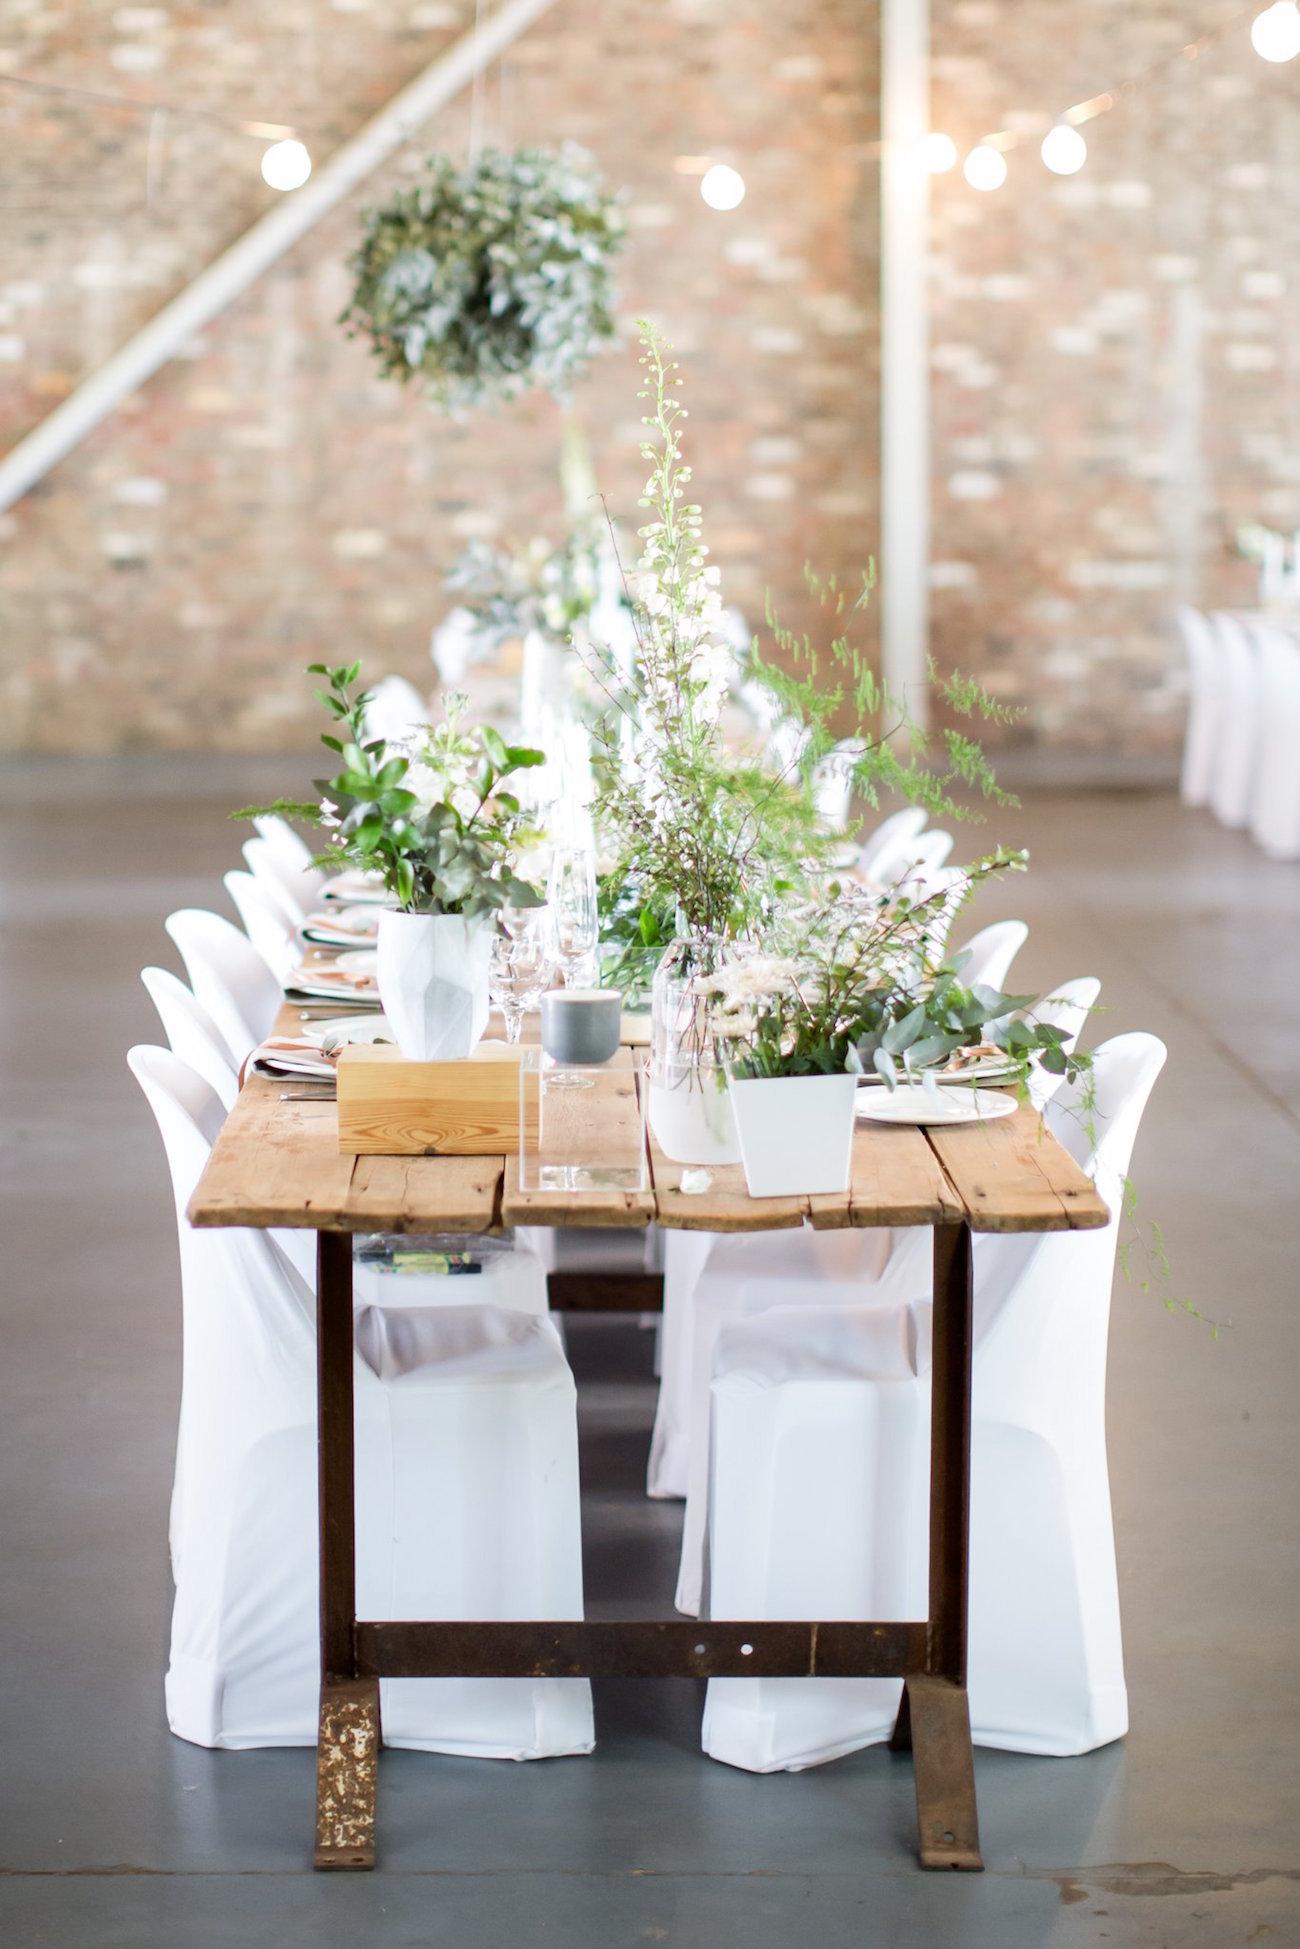 White & greenery tablescape | Image: JCclick